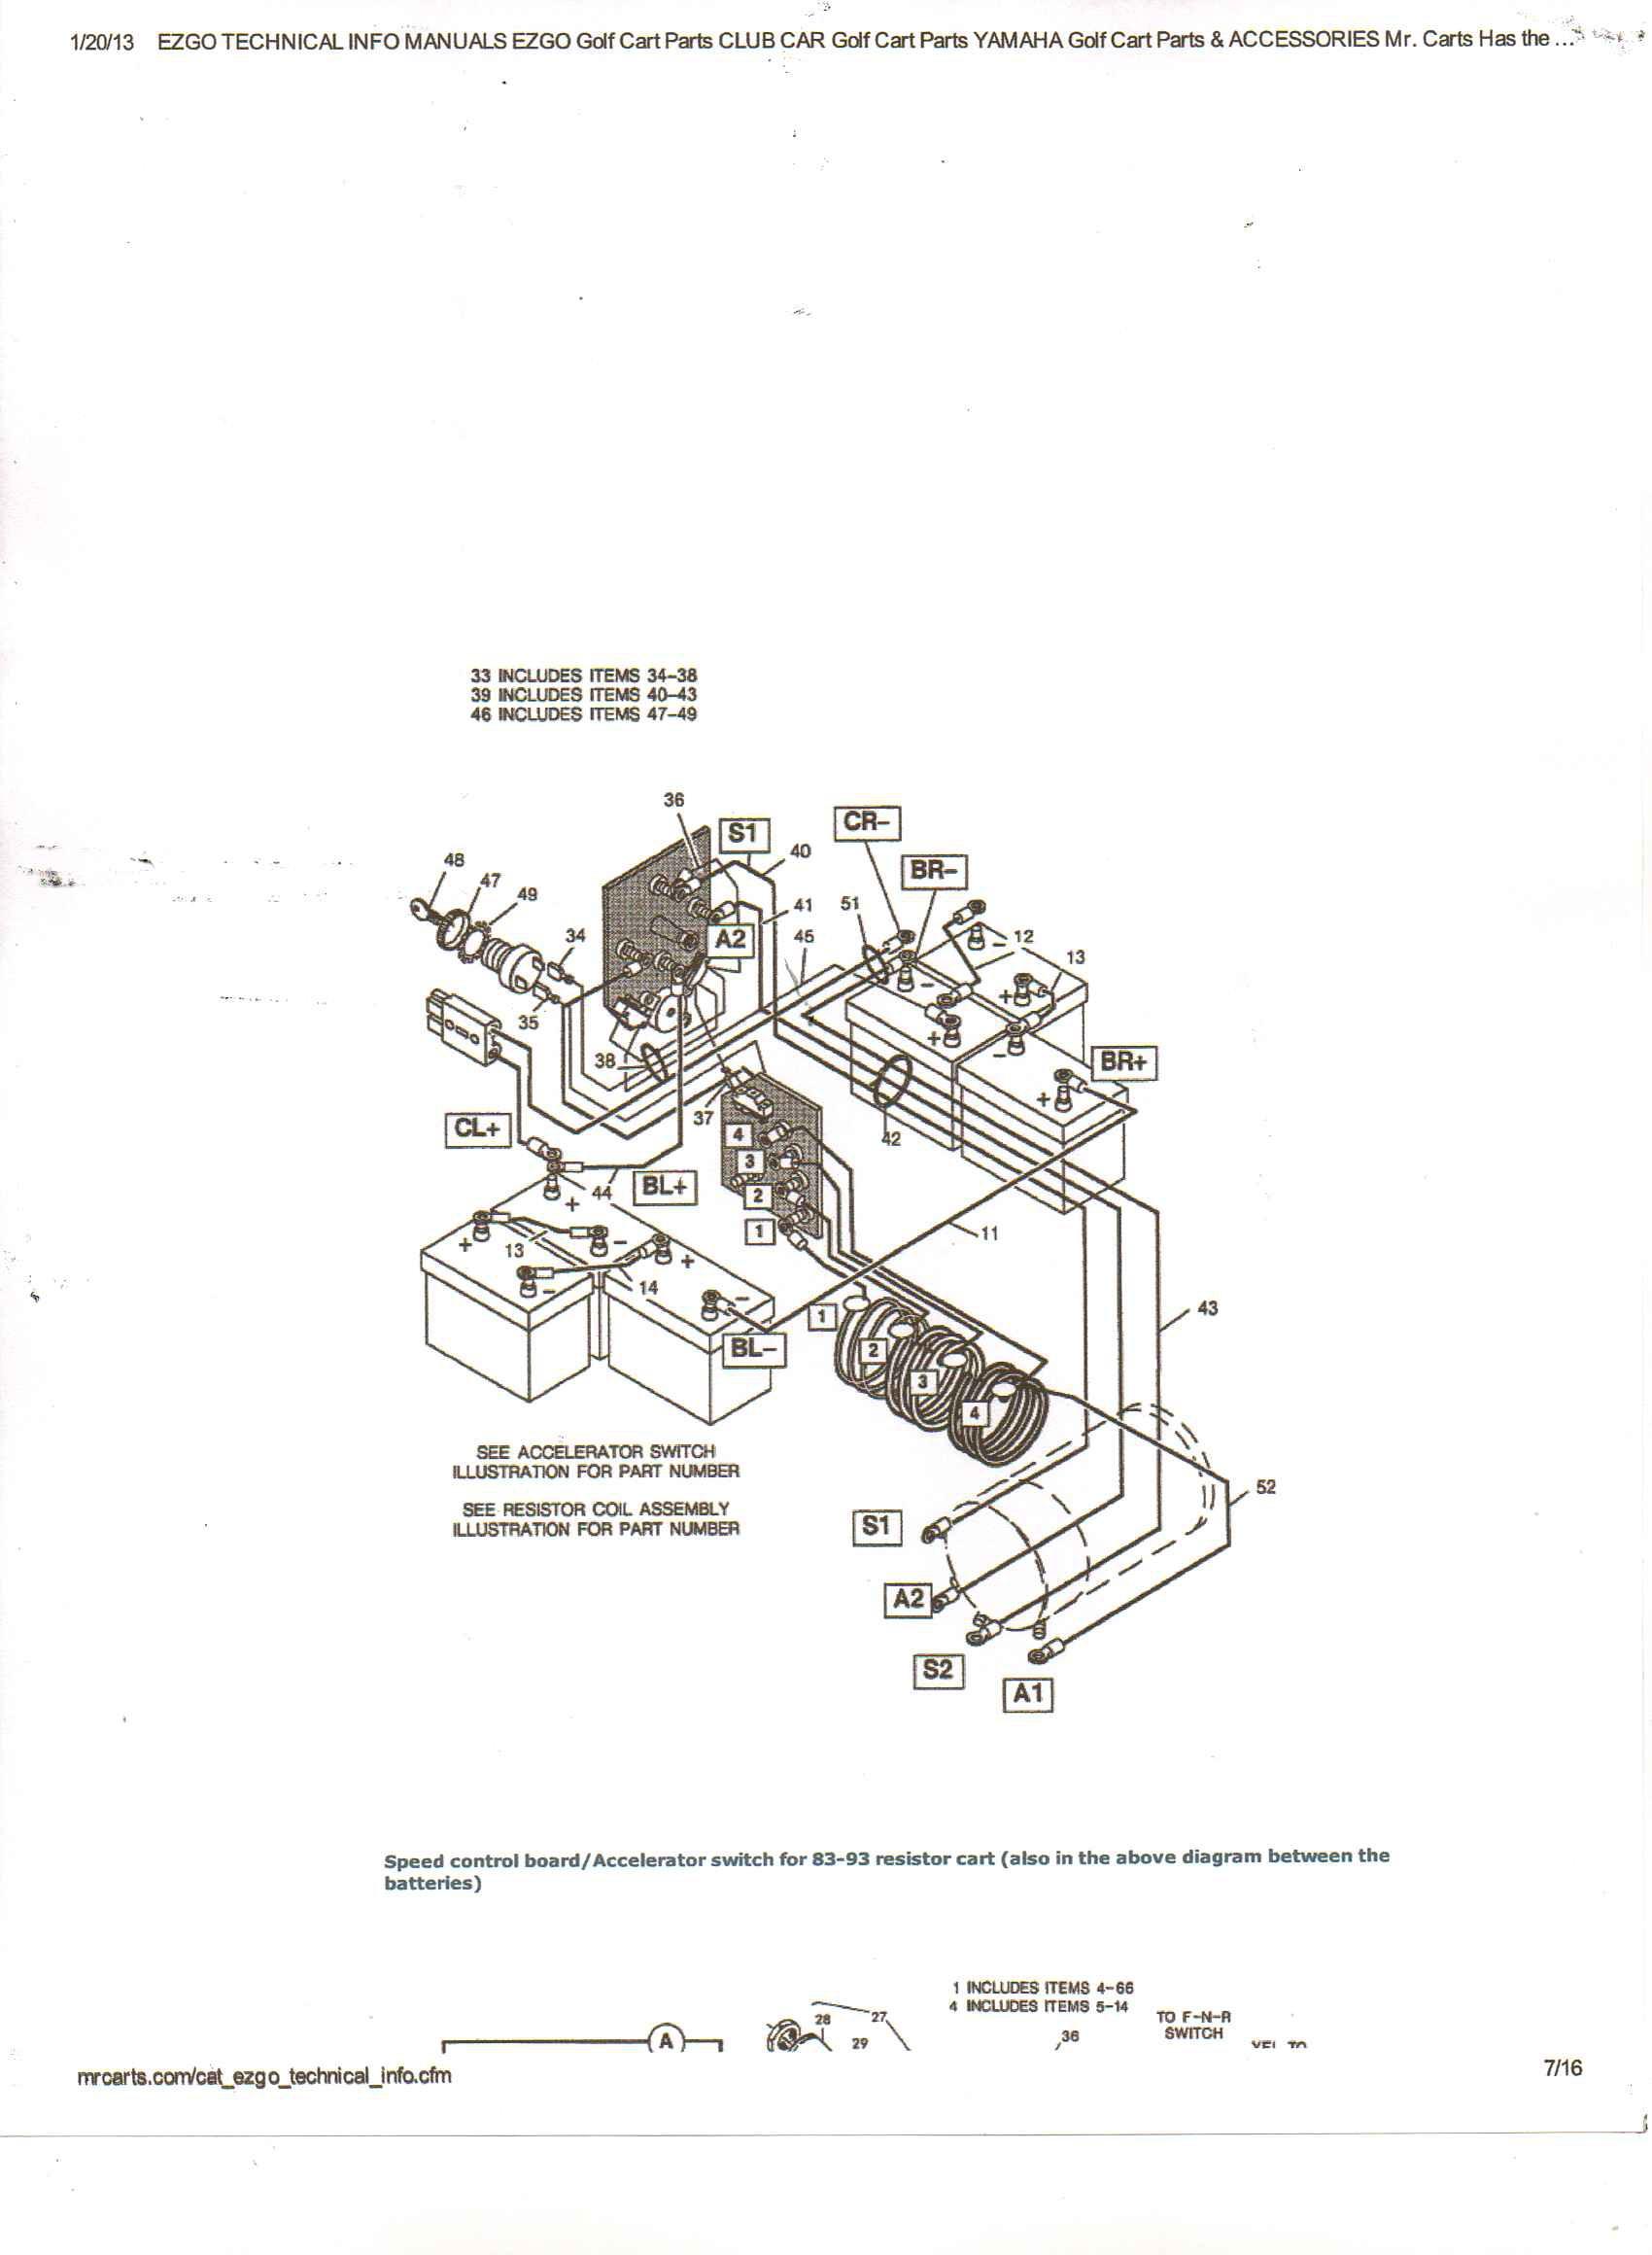 hight resolution of ezgo golf cart wiring diagram tryit me 3 hastalavista ezgo golf cart wiring diagram